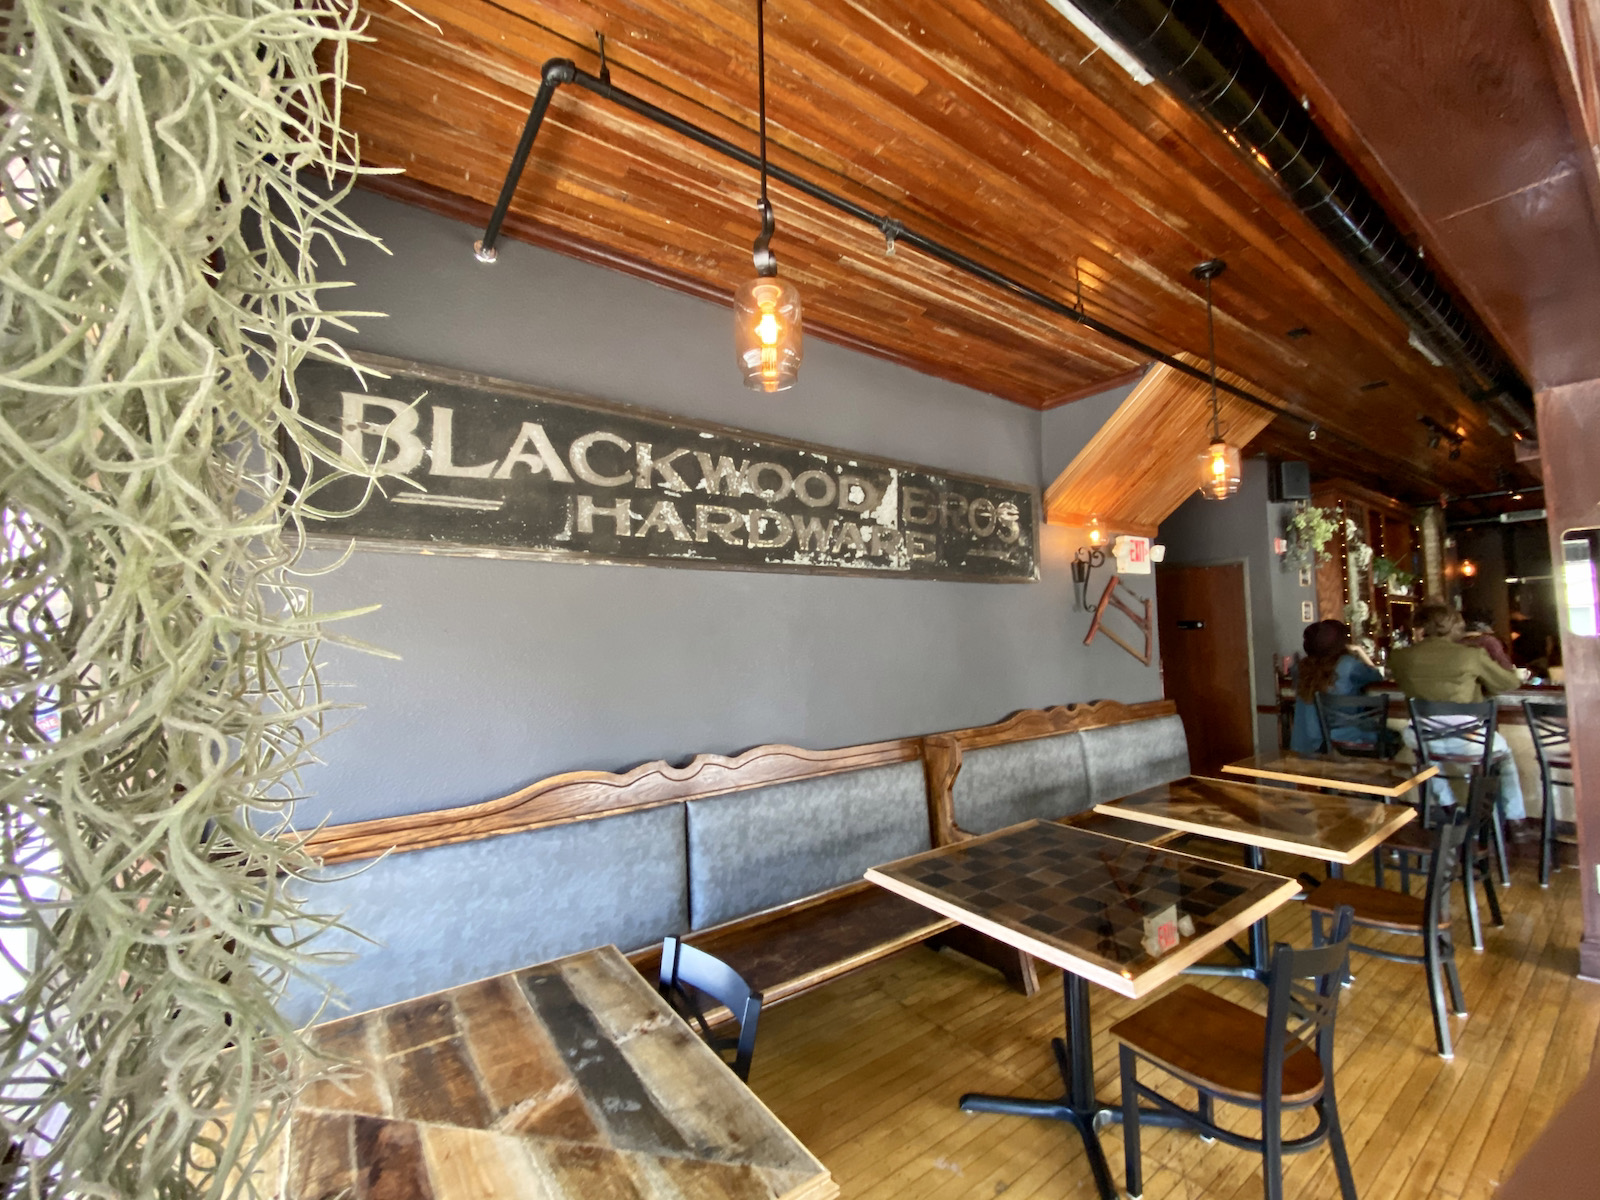 Original Blackwood Brothers Hardware Store sign